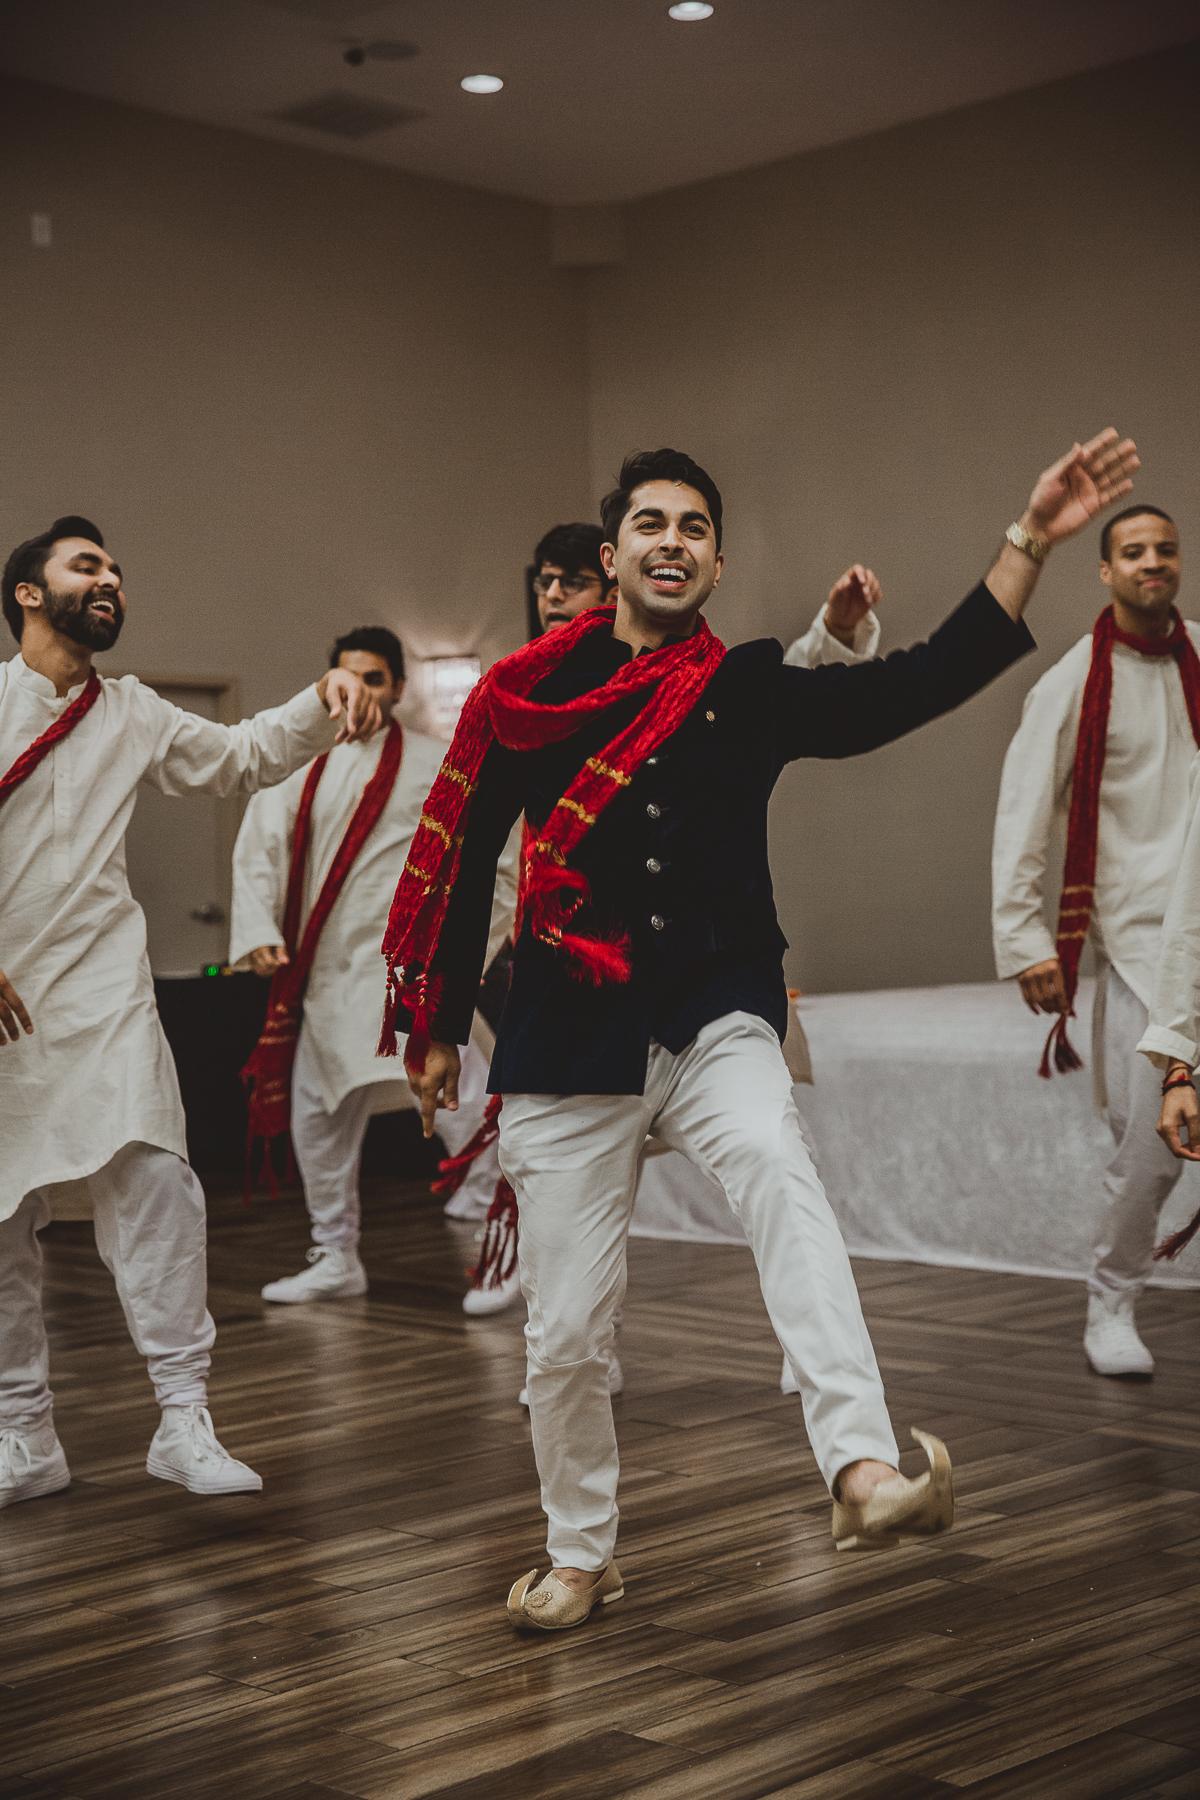 indian-american-fusian-sangeet-kelley-raye-atlanta-los-angeles-wedding-photographer-62.jpg